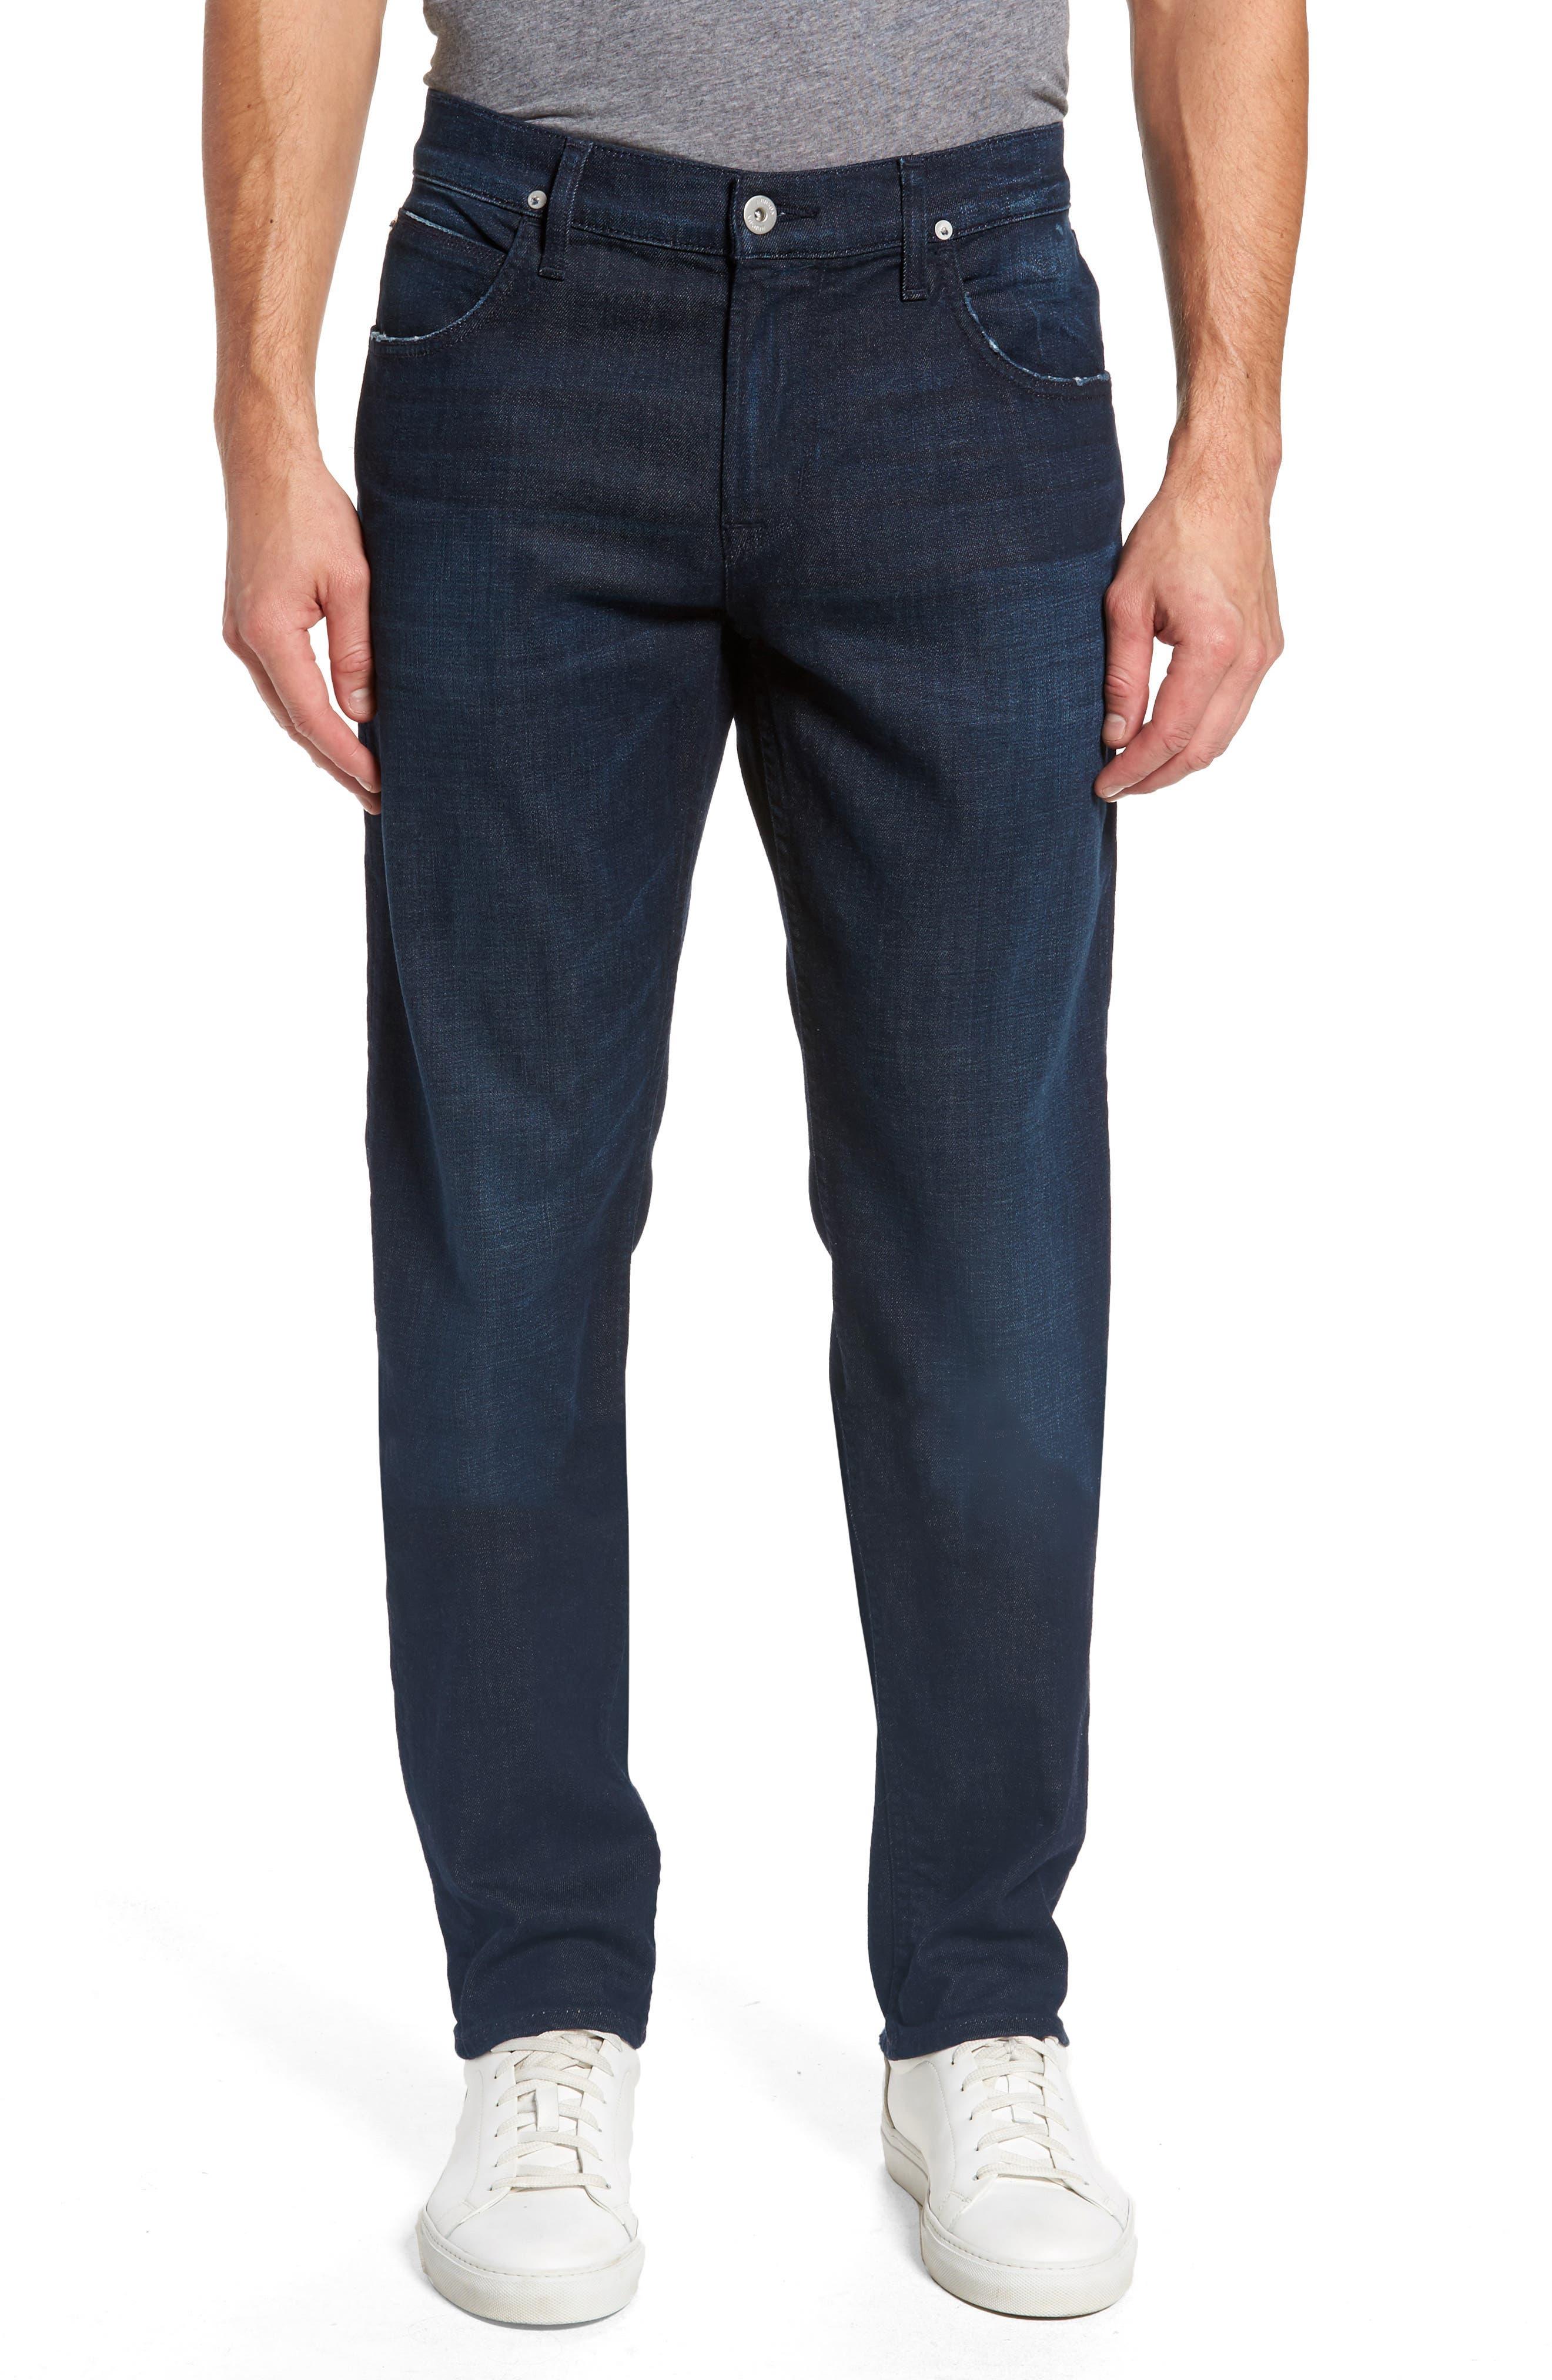 Alternate Image 1 Selected - Hudson Jeans Blake Slim Fit Jeans (Evening Hush)